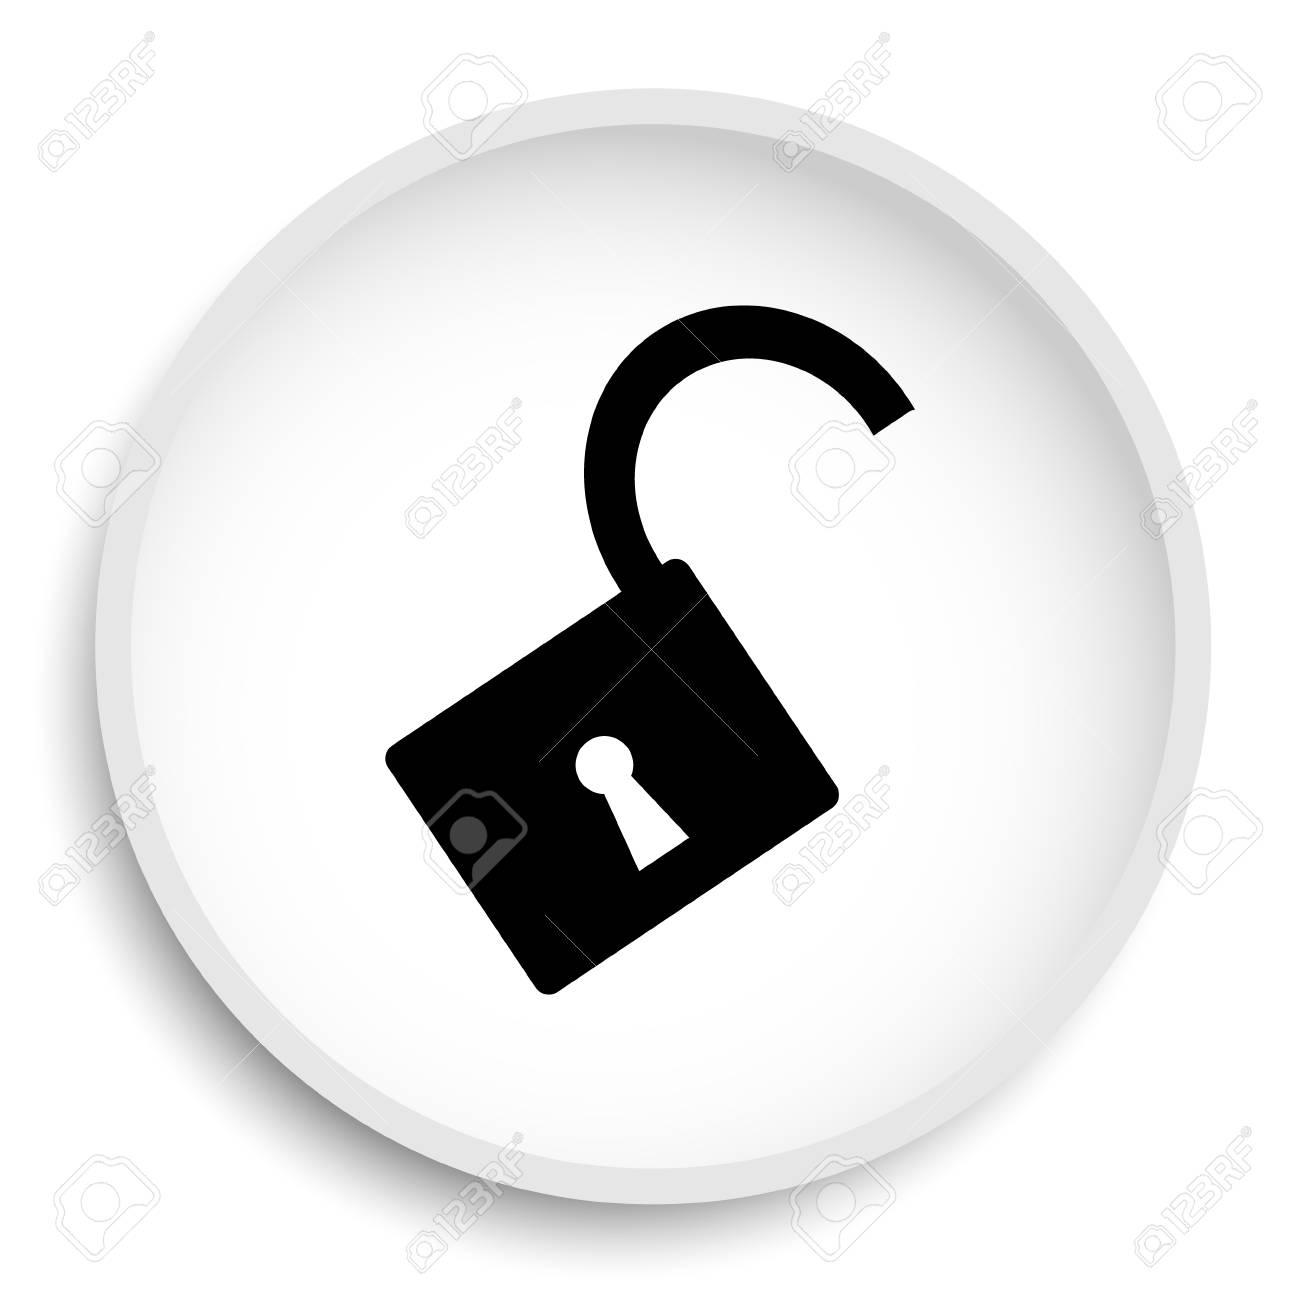 Open lock icon  Open lock website button on white background